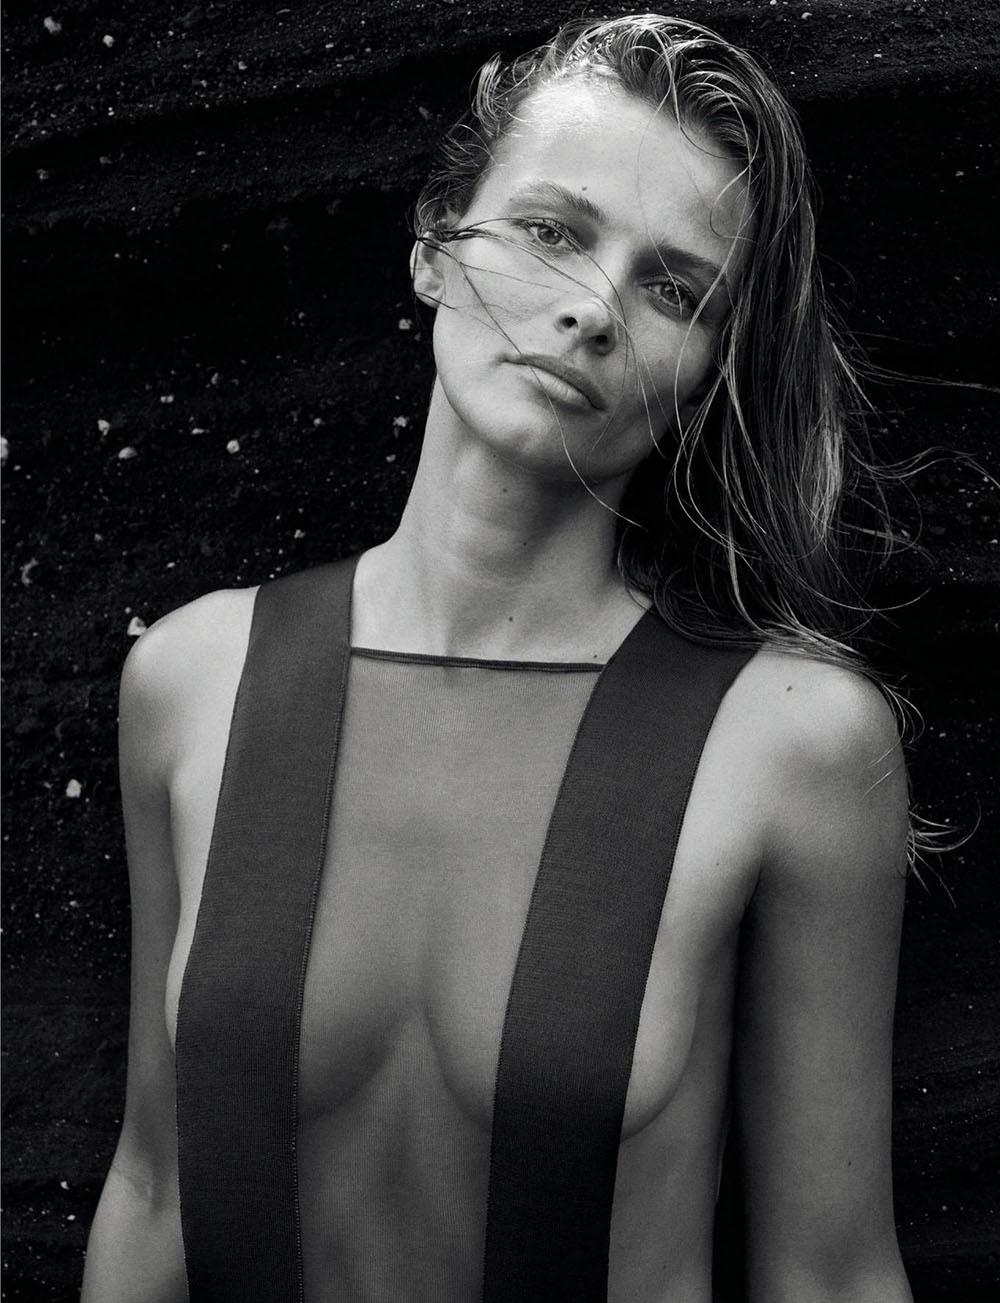 Edita Vilkeviciute covers Numéro May 2020 by Sebastian Kim